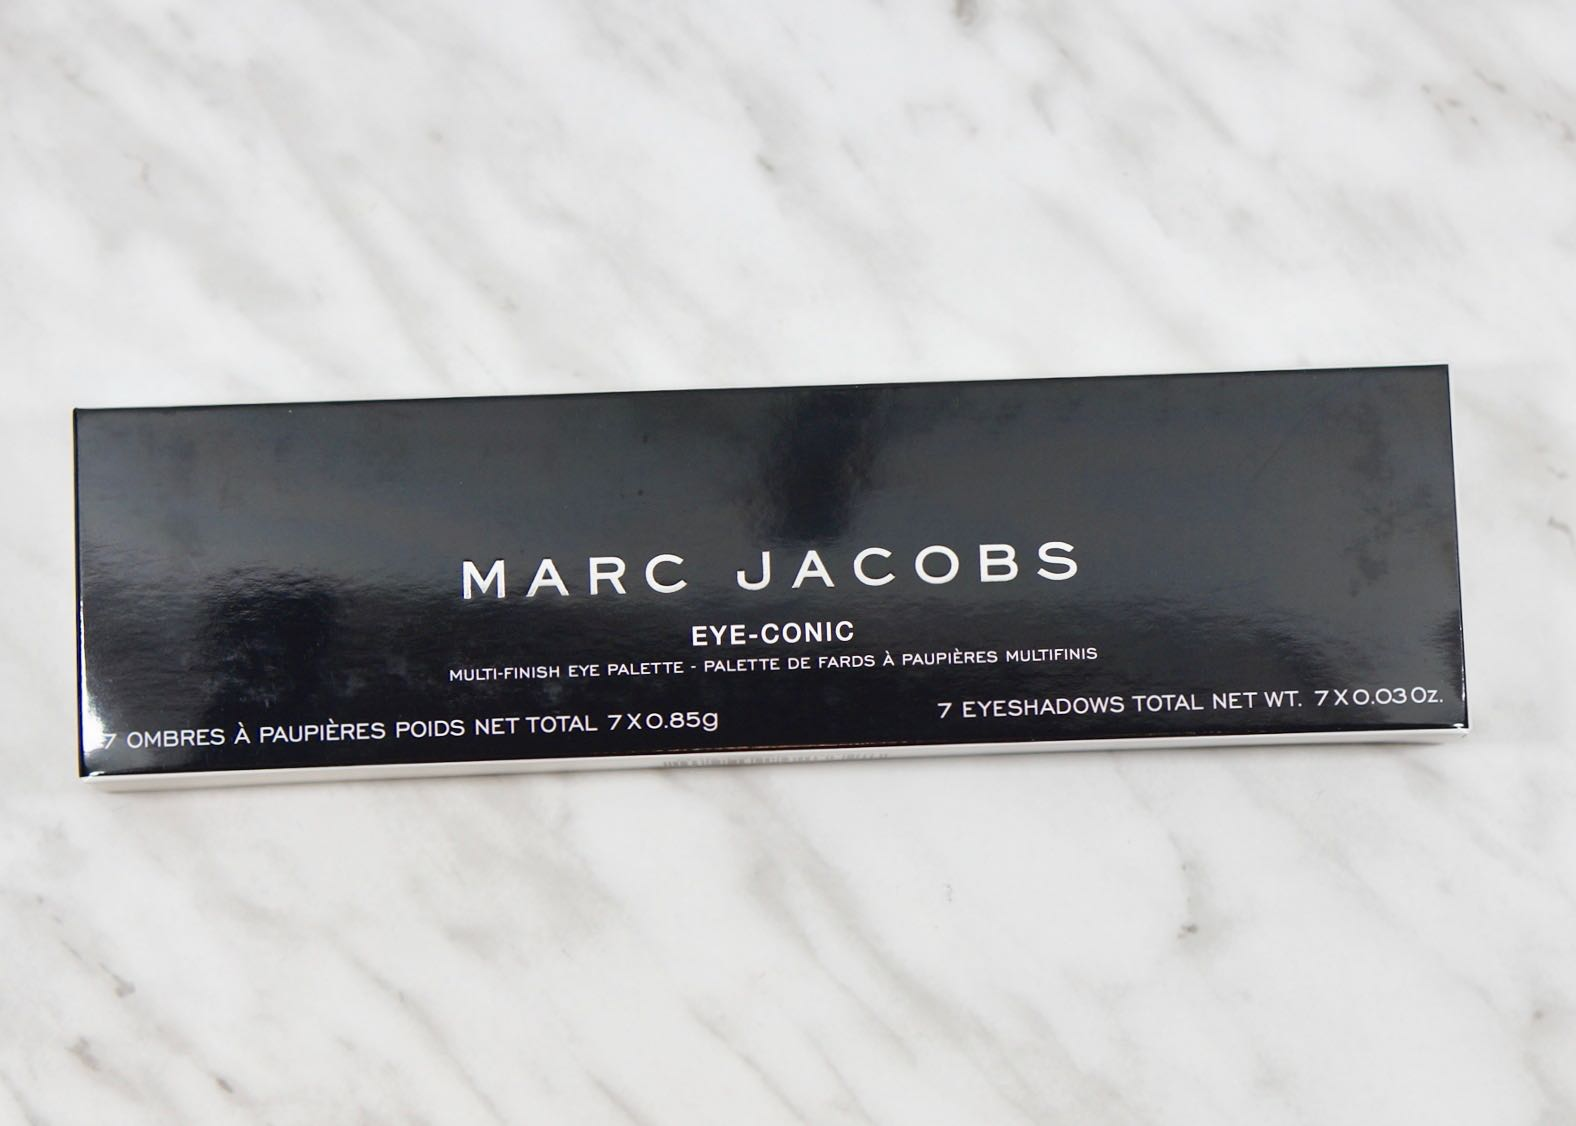 Marc Jacobs Eye-Conic Palette-720 GlambitionDSC04968.jpg